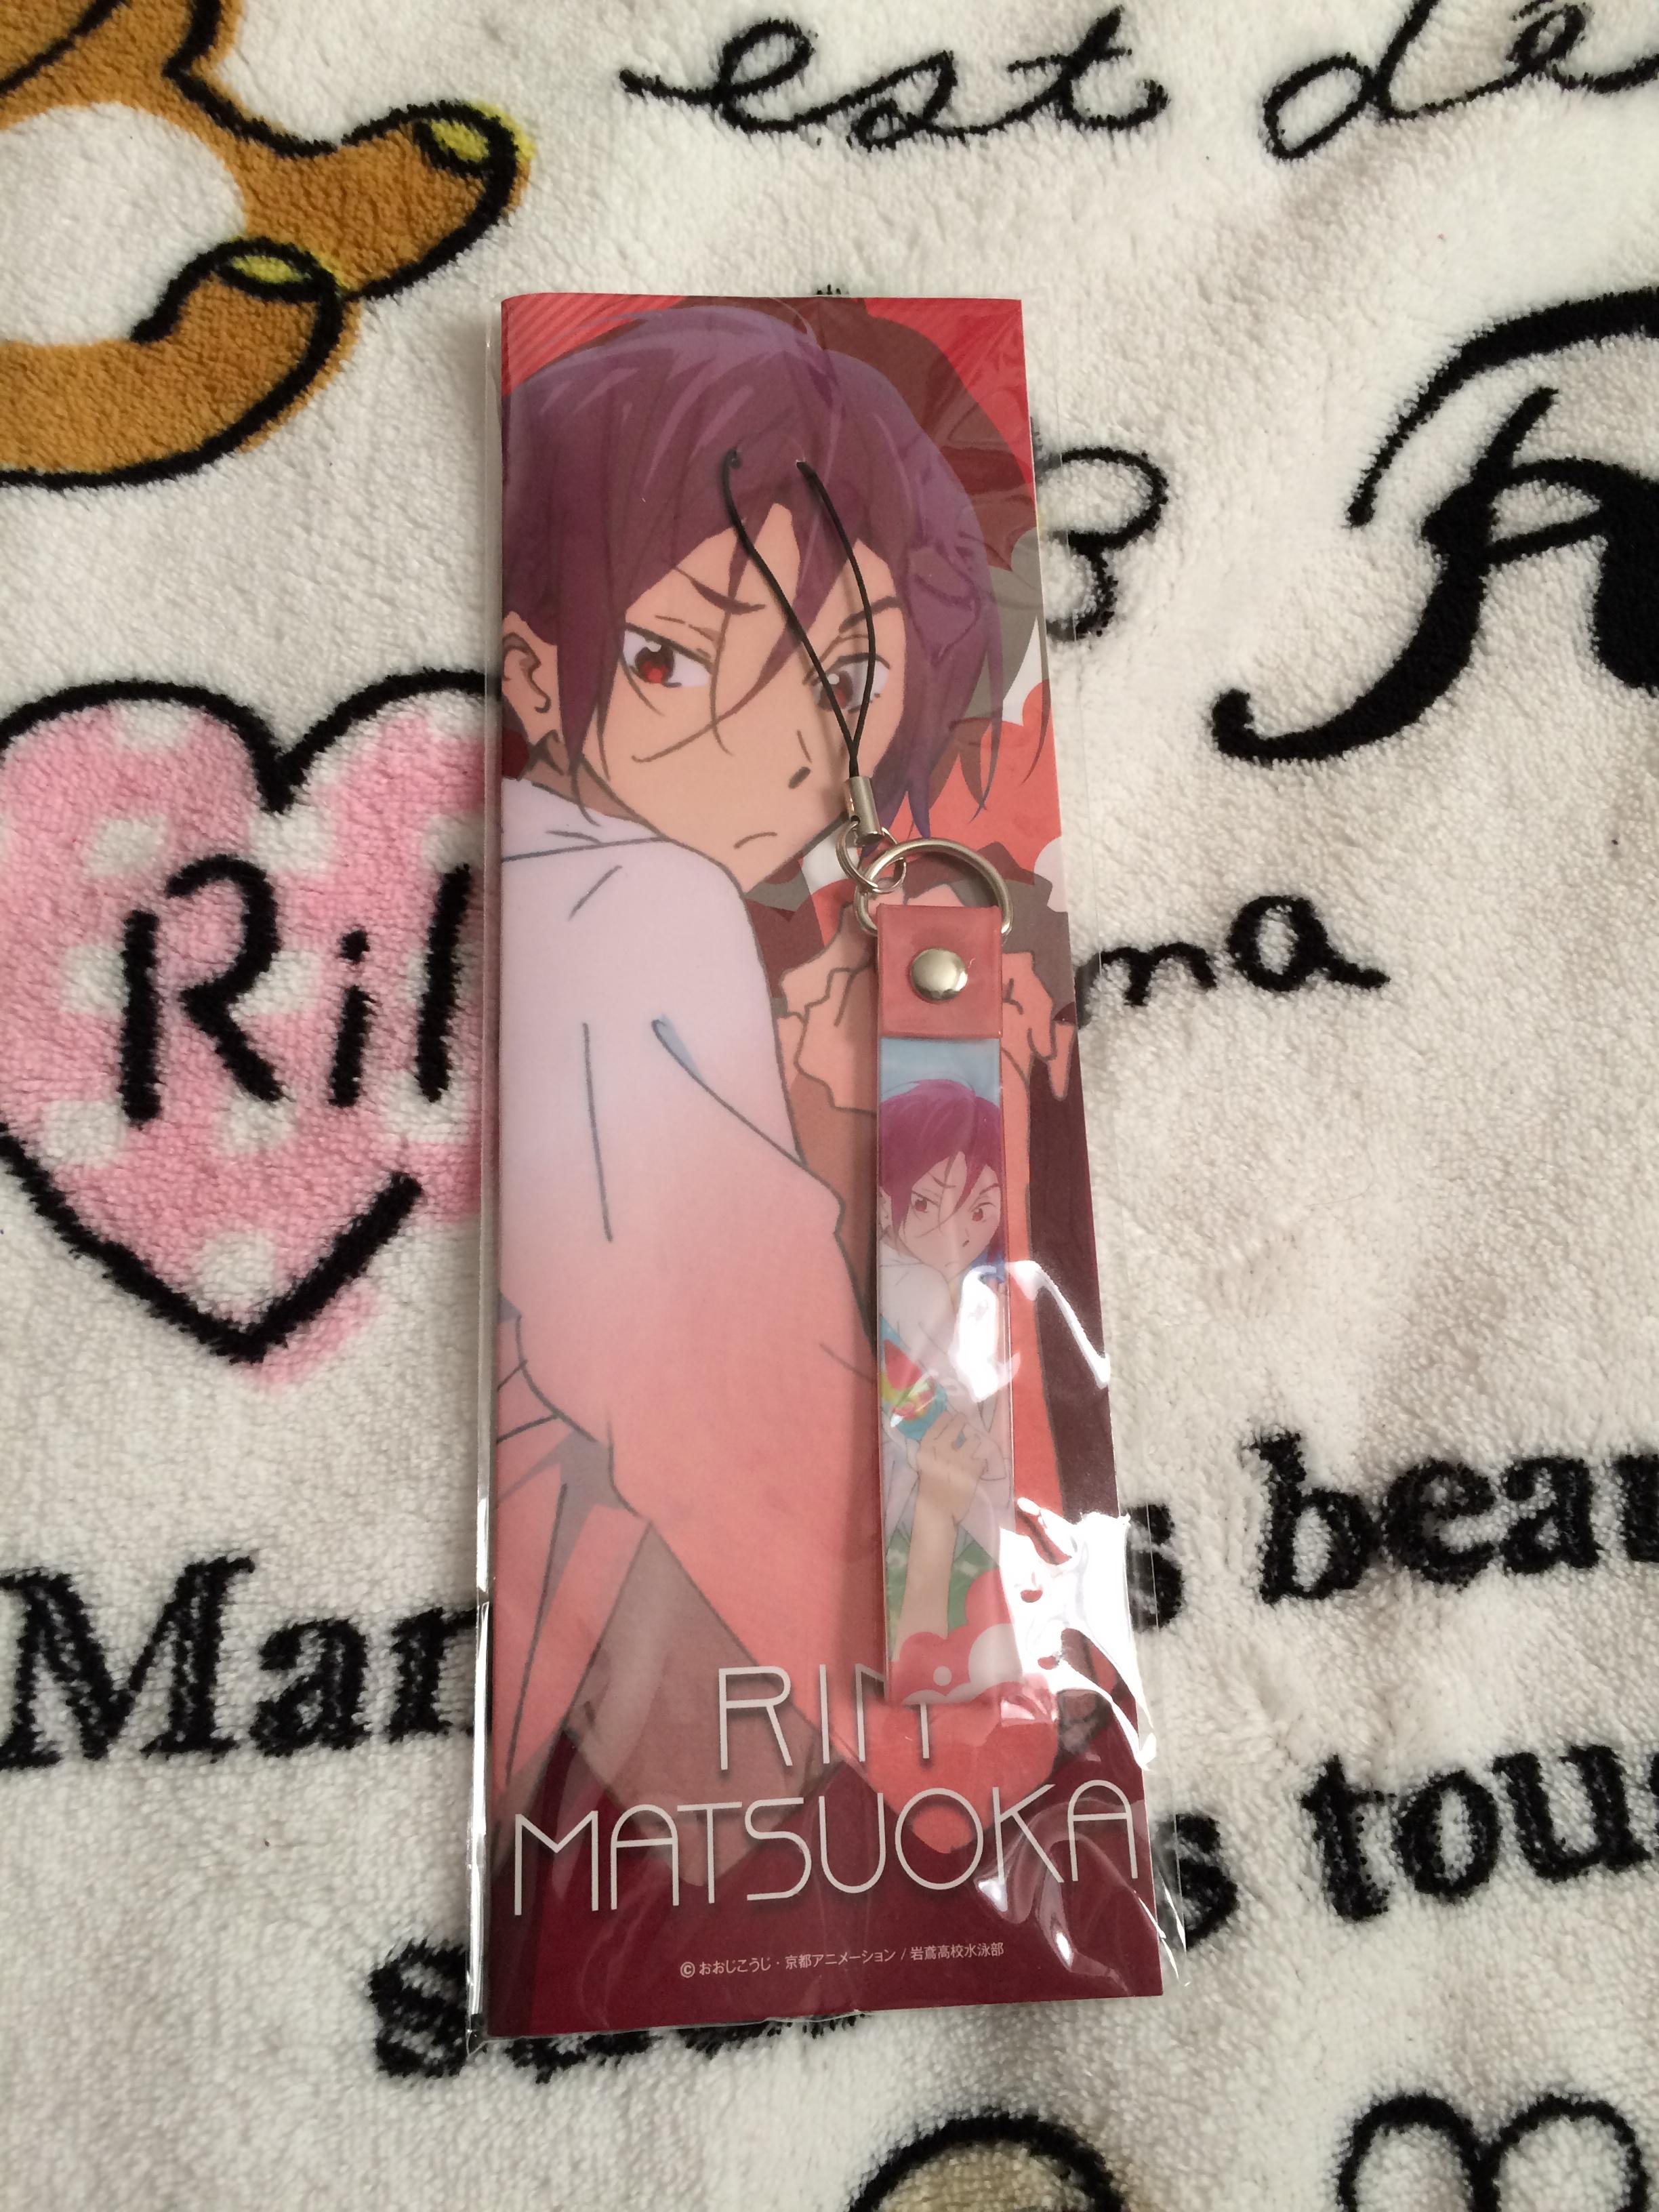 Free Iwatobi Swim Club Rin Matsuoka Phone Wrist Strap On Storenvy Bear Pink Img 3079 Original